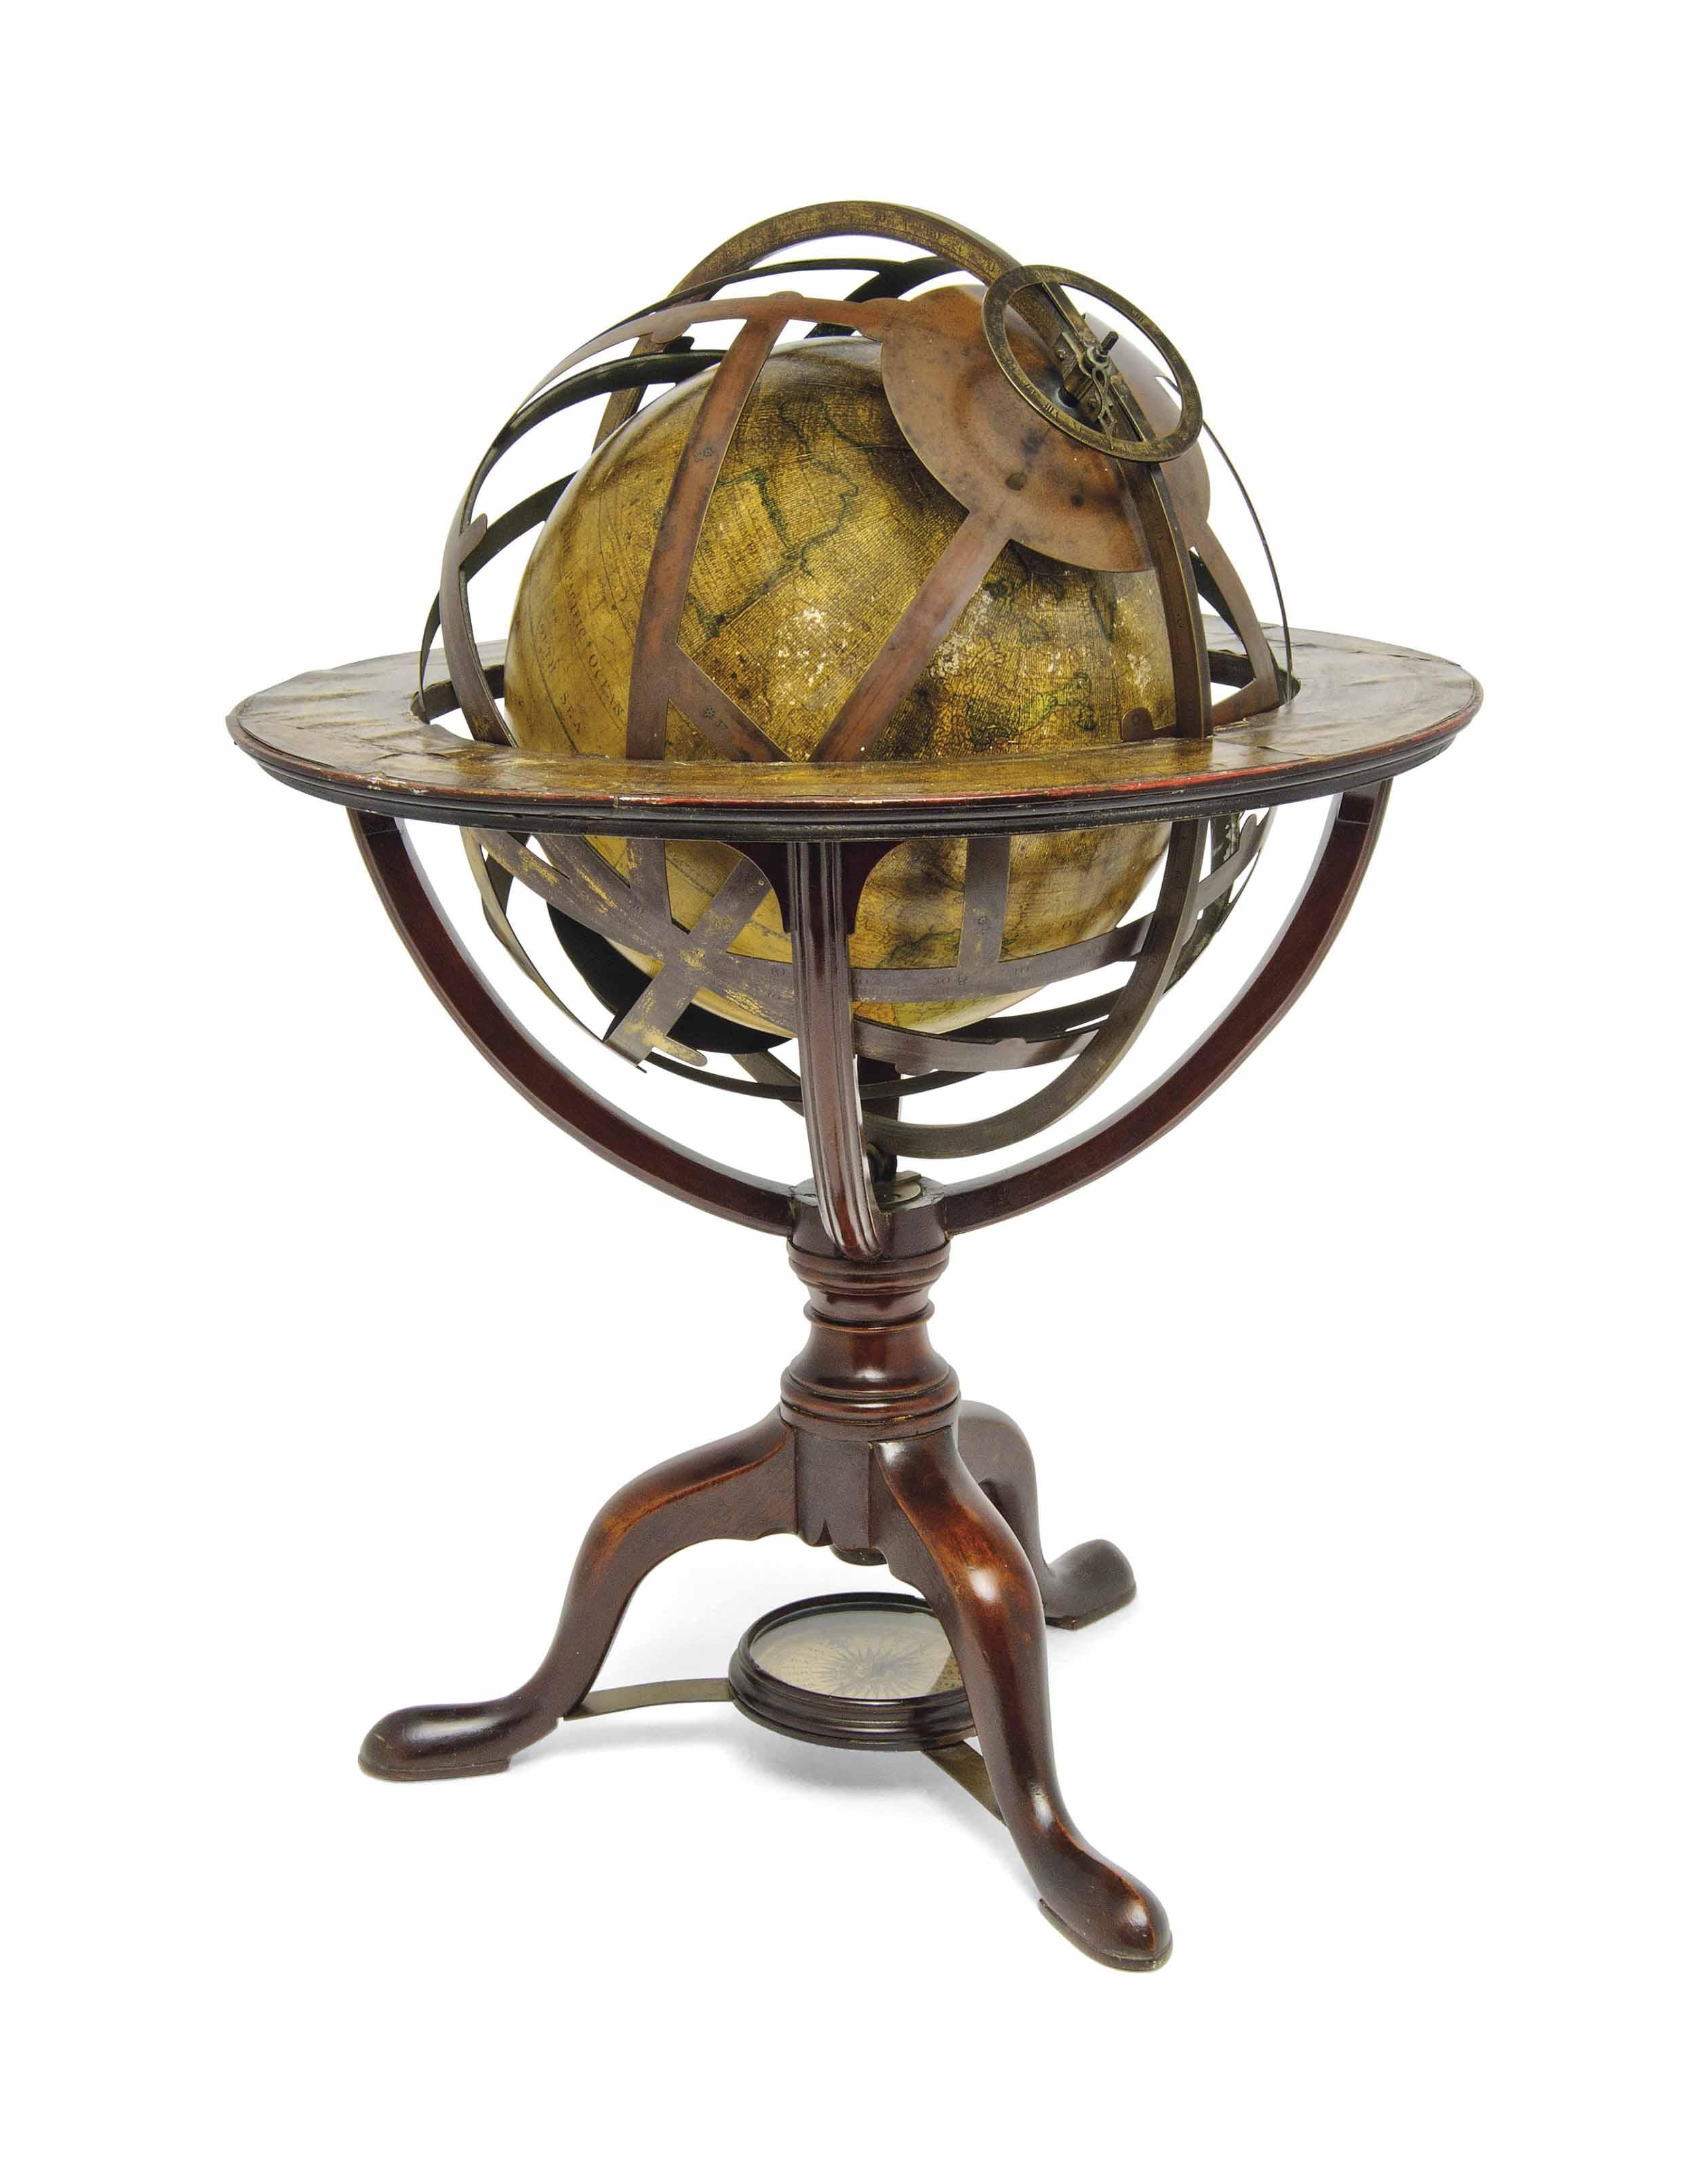 An English 15-inch Armillary Sphere